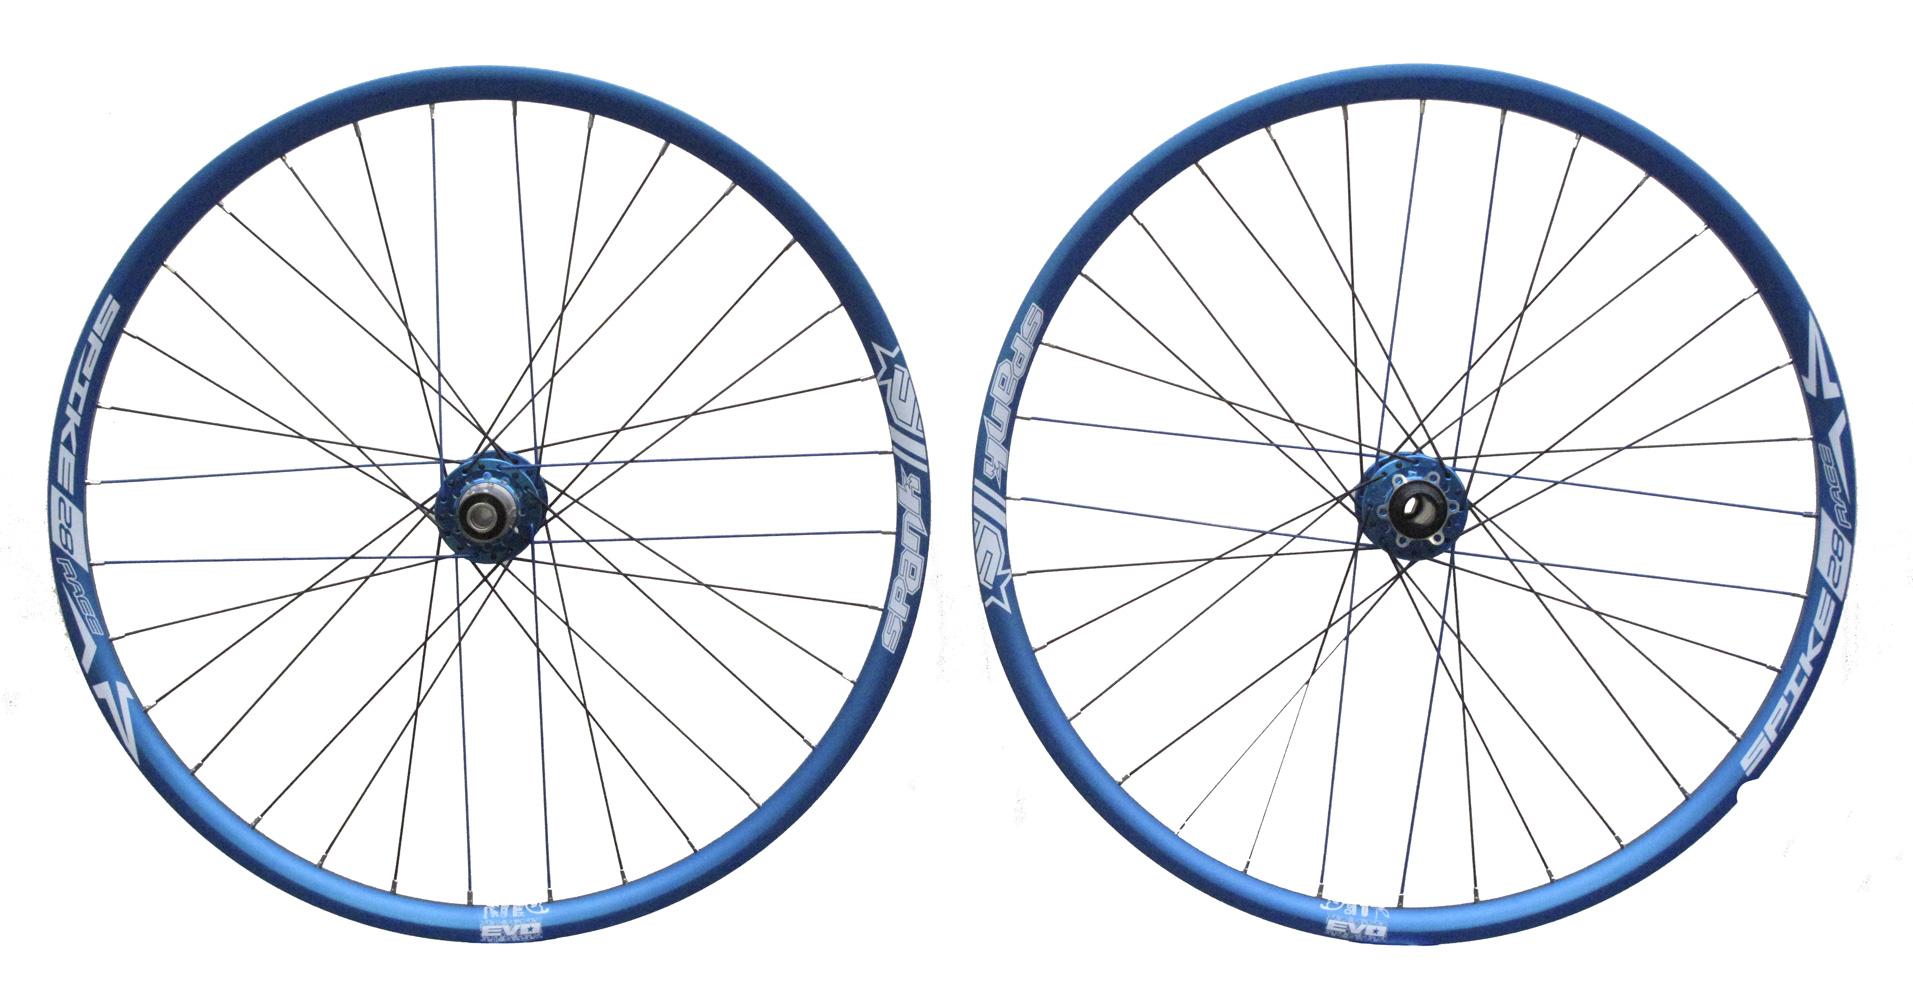 All not spank rims wheel set consider